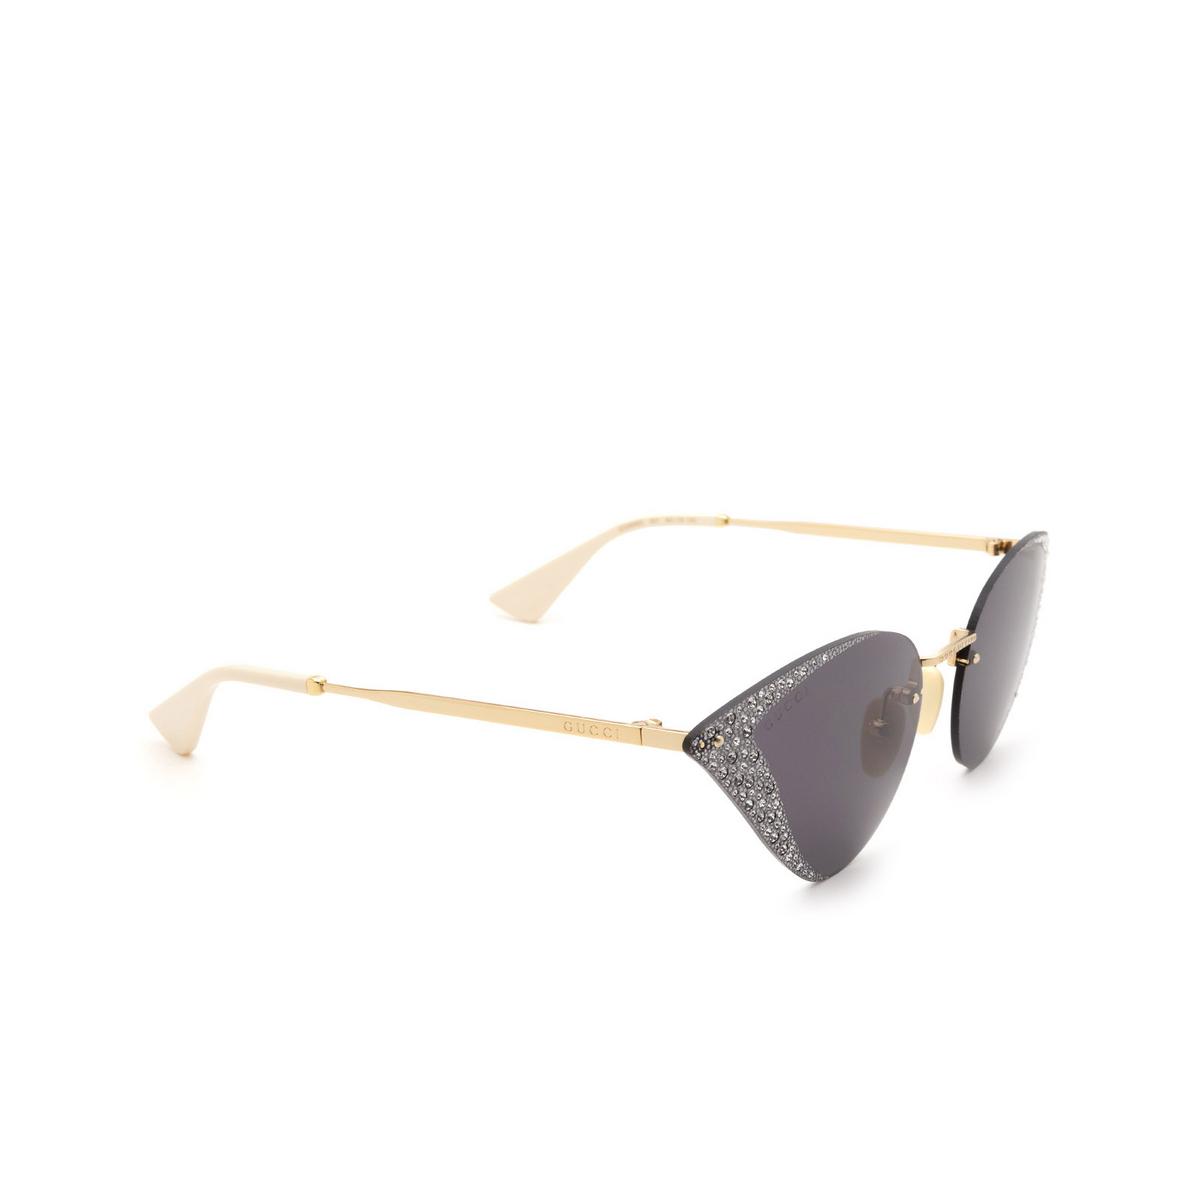 Gucci® Cat-eye Sunglasses: GG0898S color Gold 001.